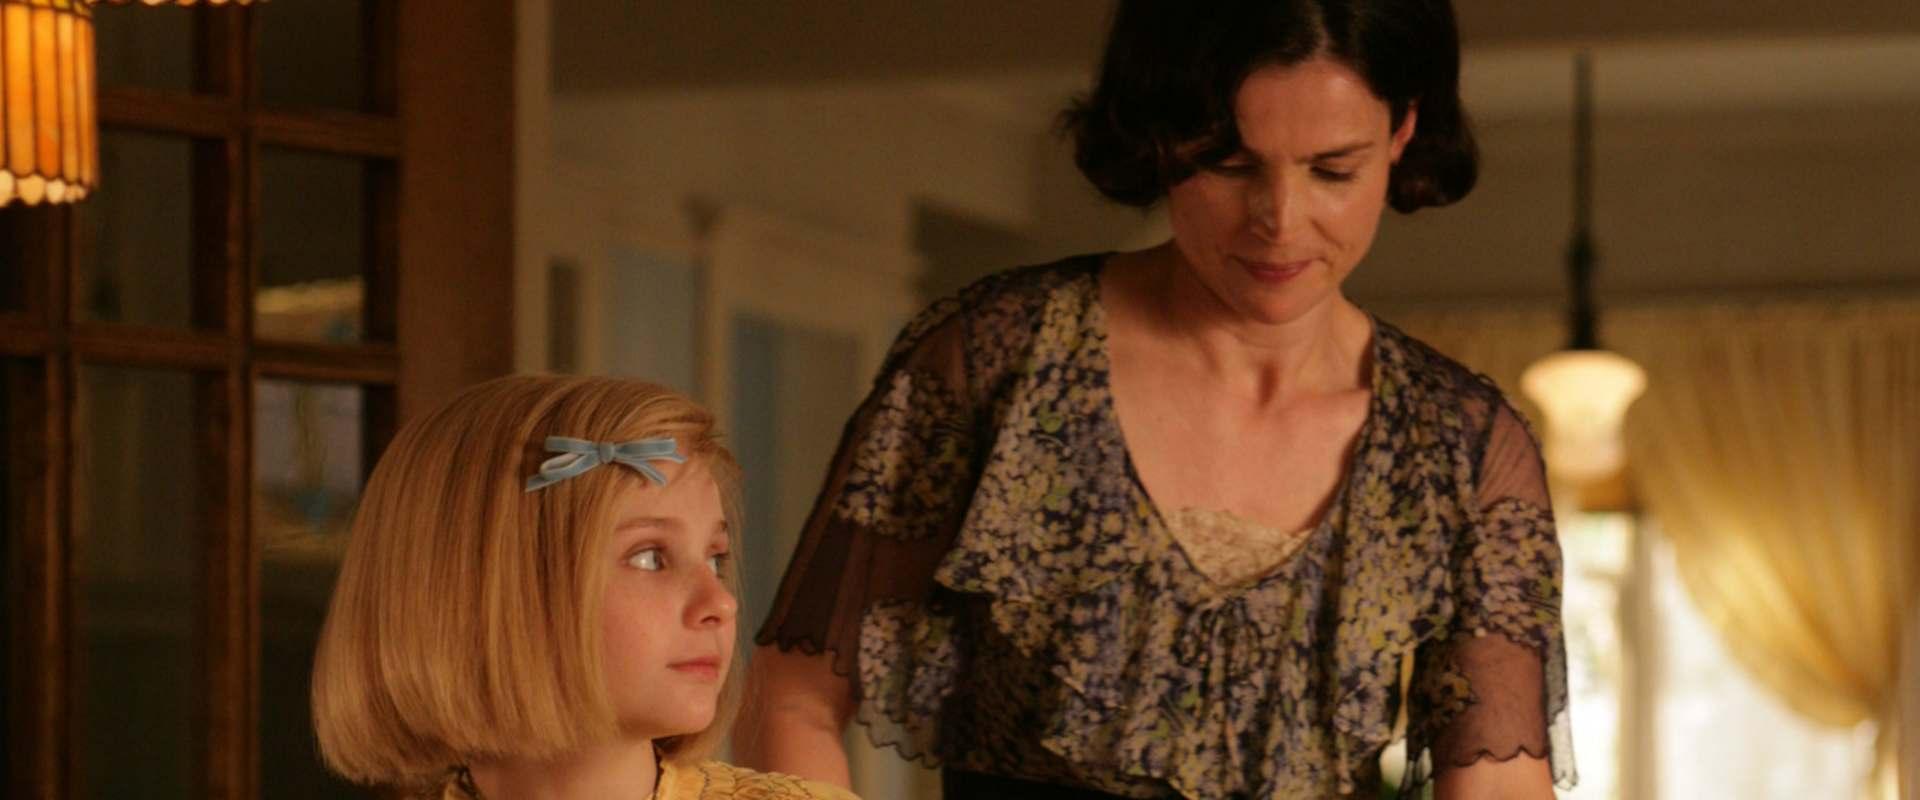 Watch Kit Kittredge An American Girl On Netflix Today